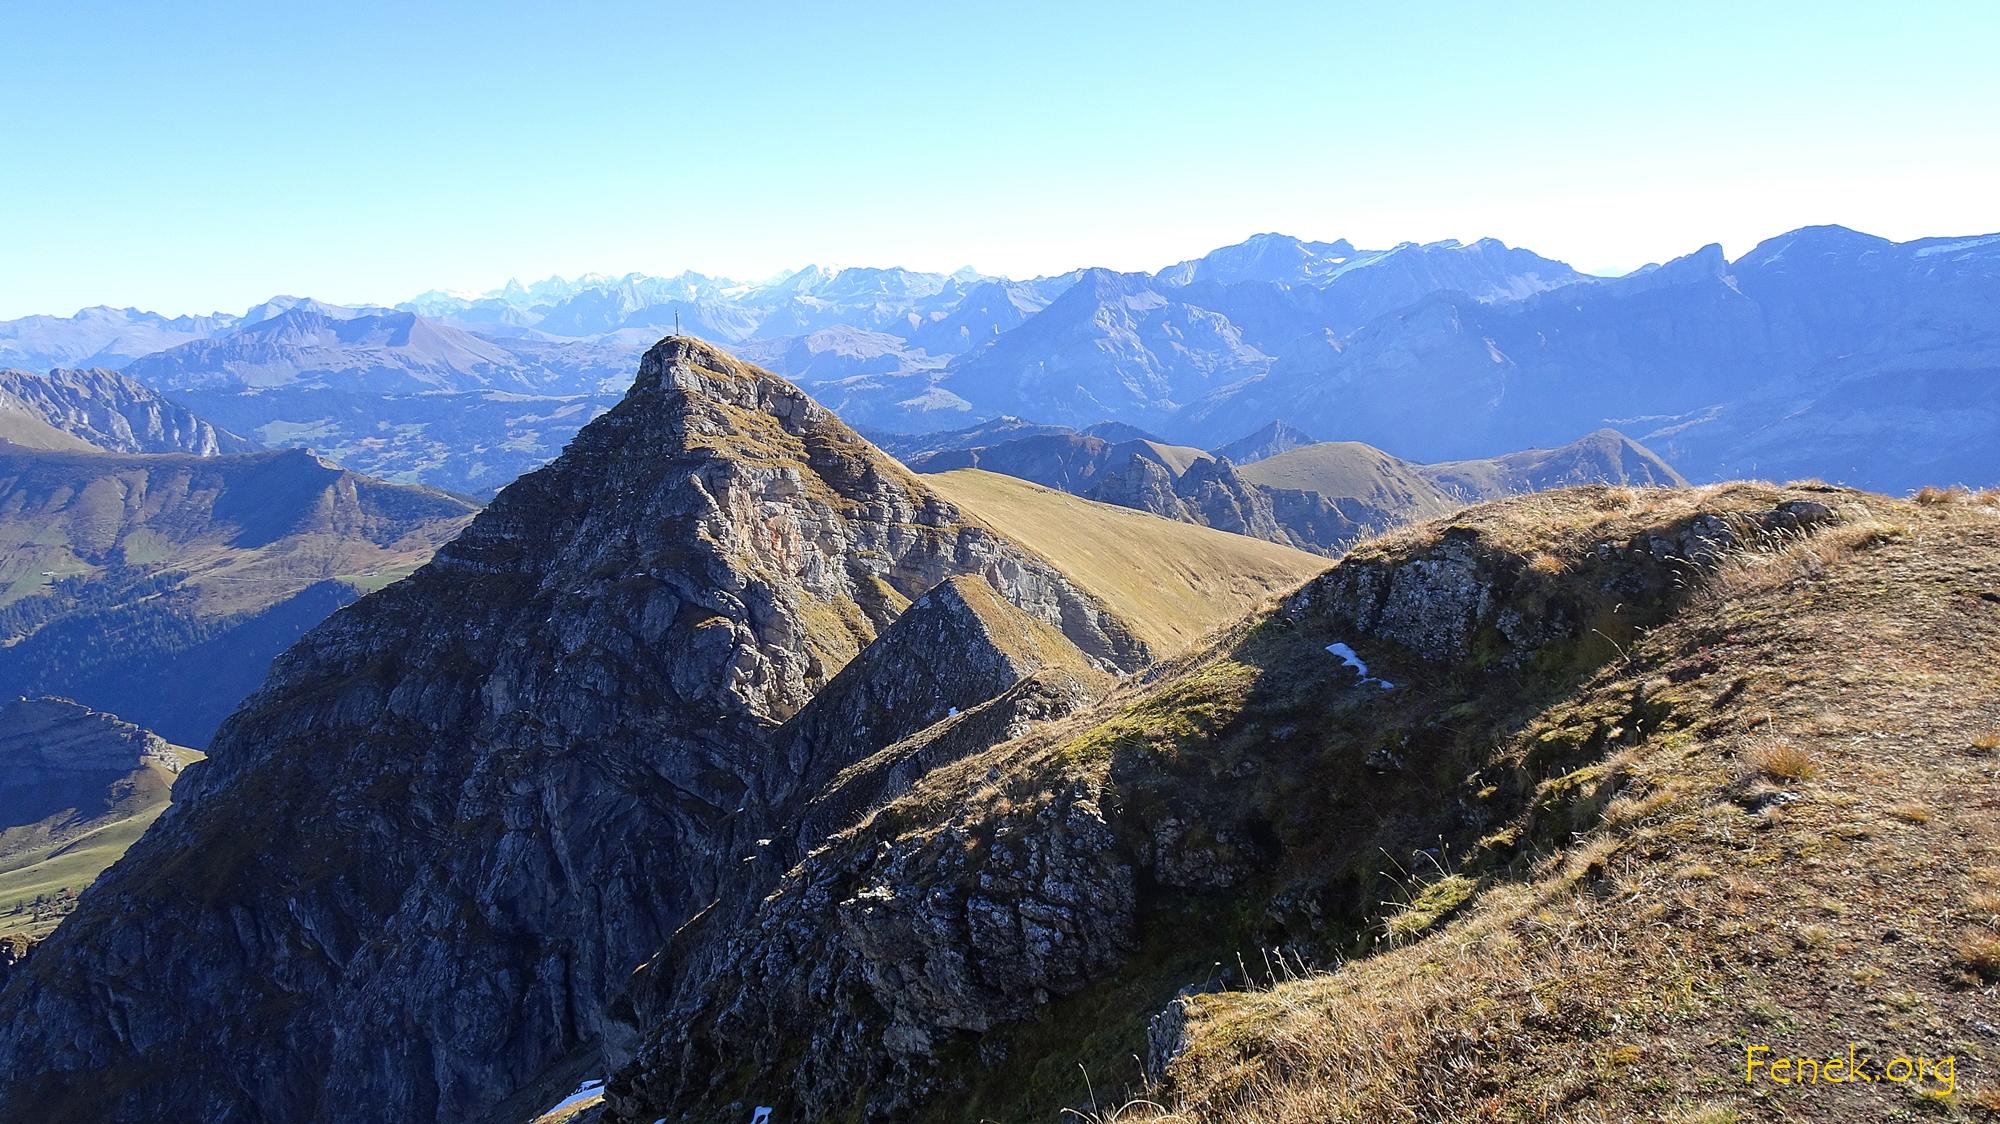 Gipfelaussicht zu La Pare - am Horizont Berner Berge